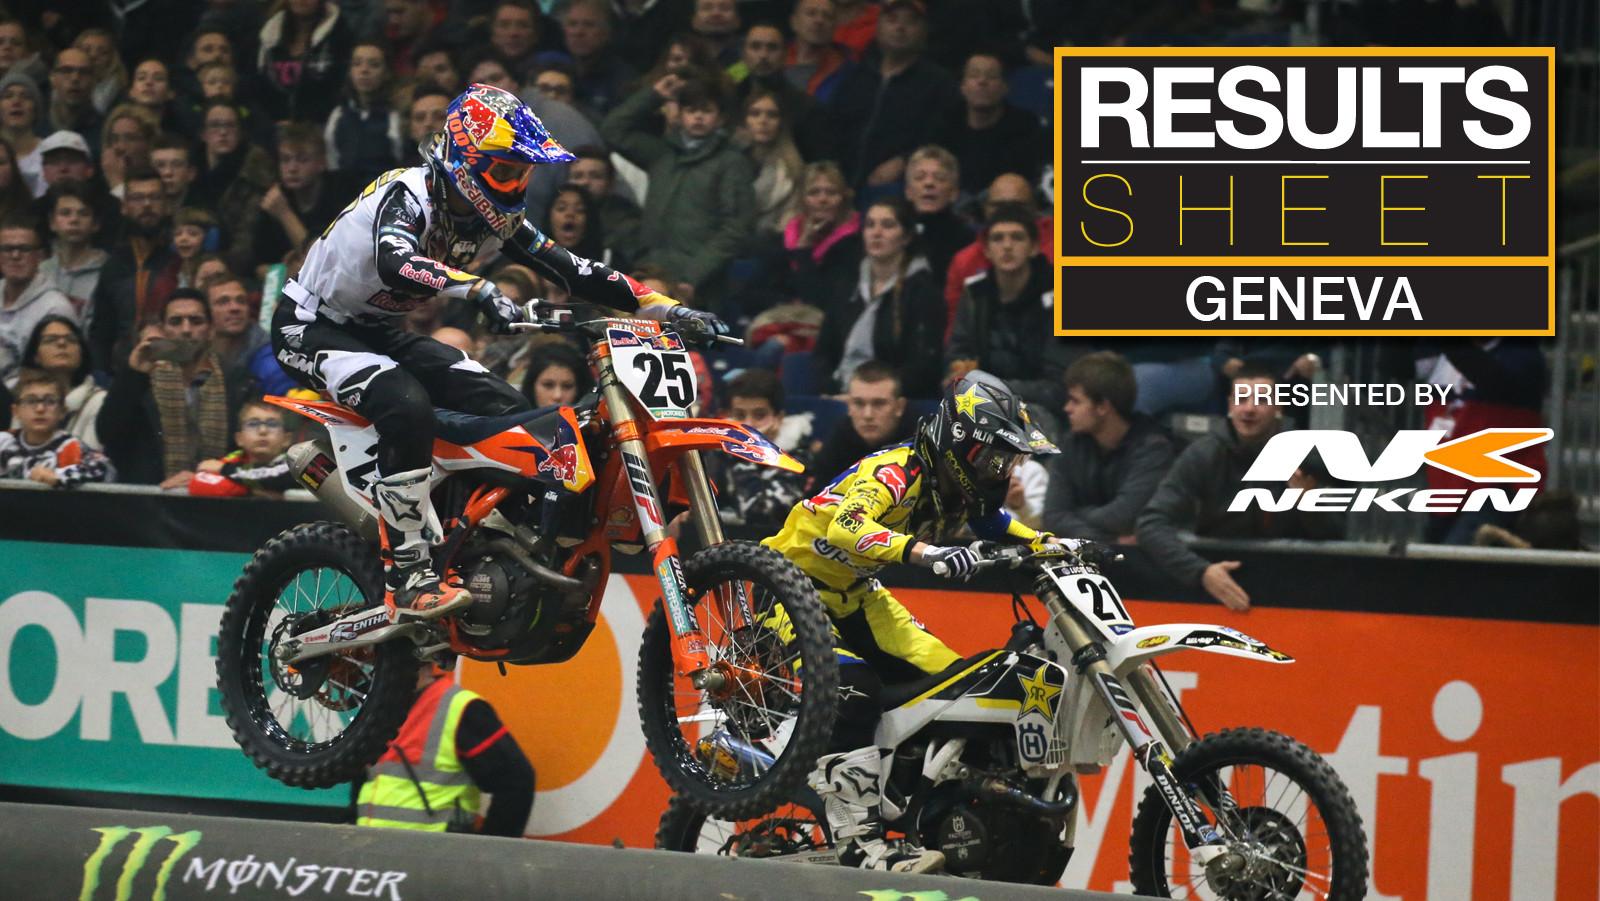 Results Sheet: Supercross Geneva Night One